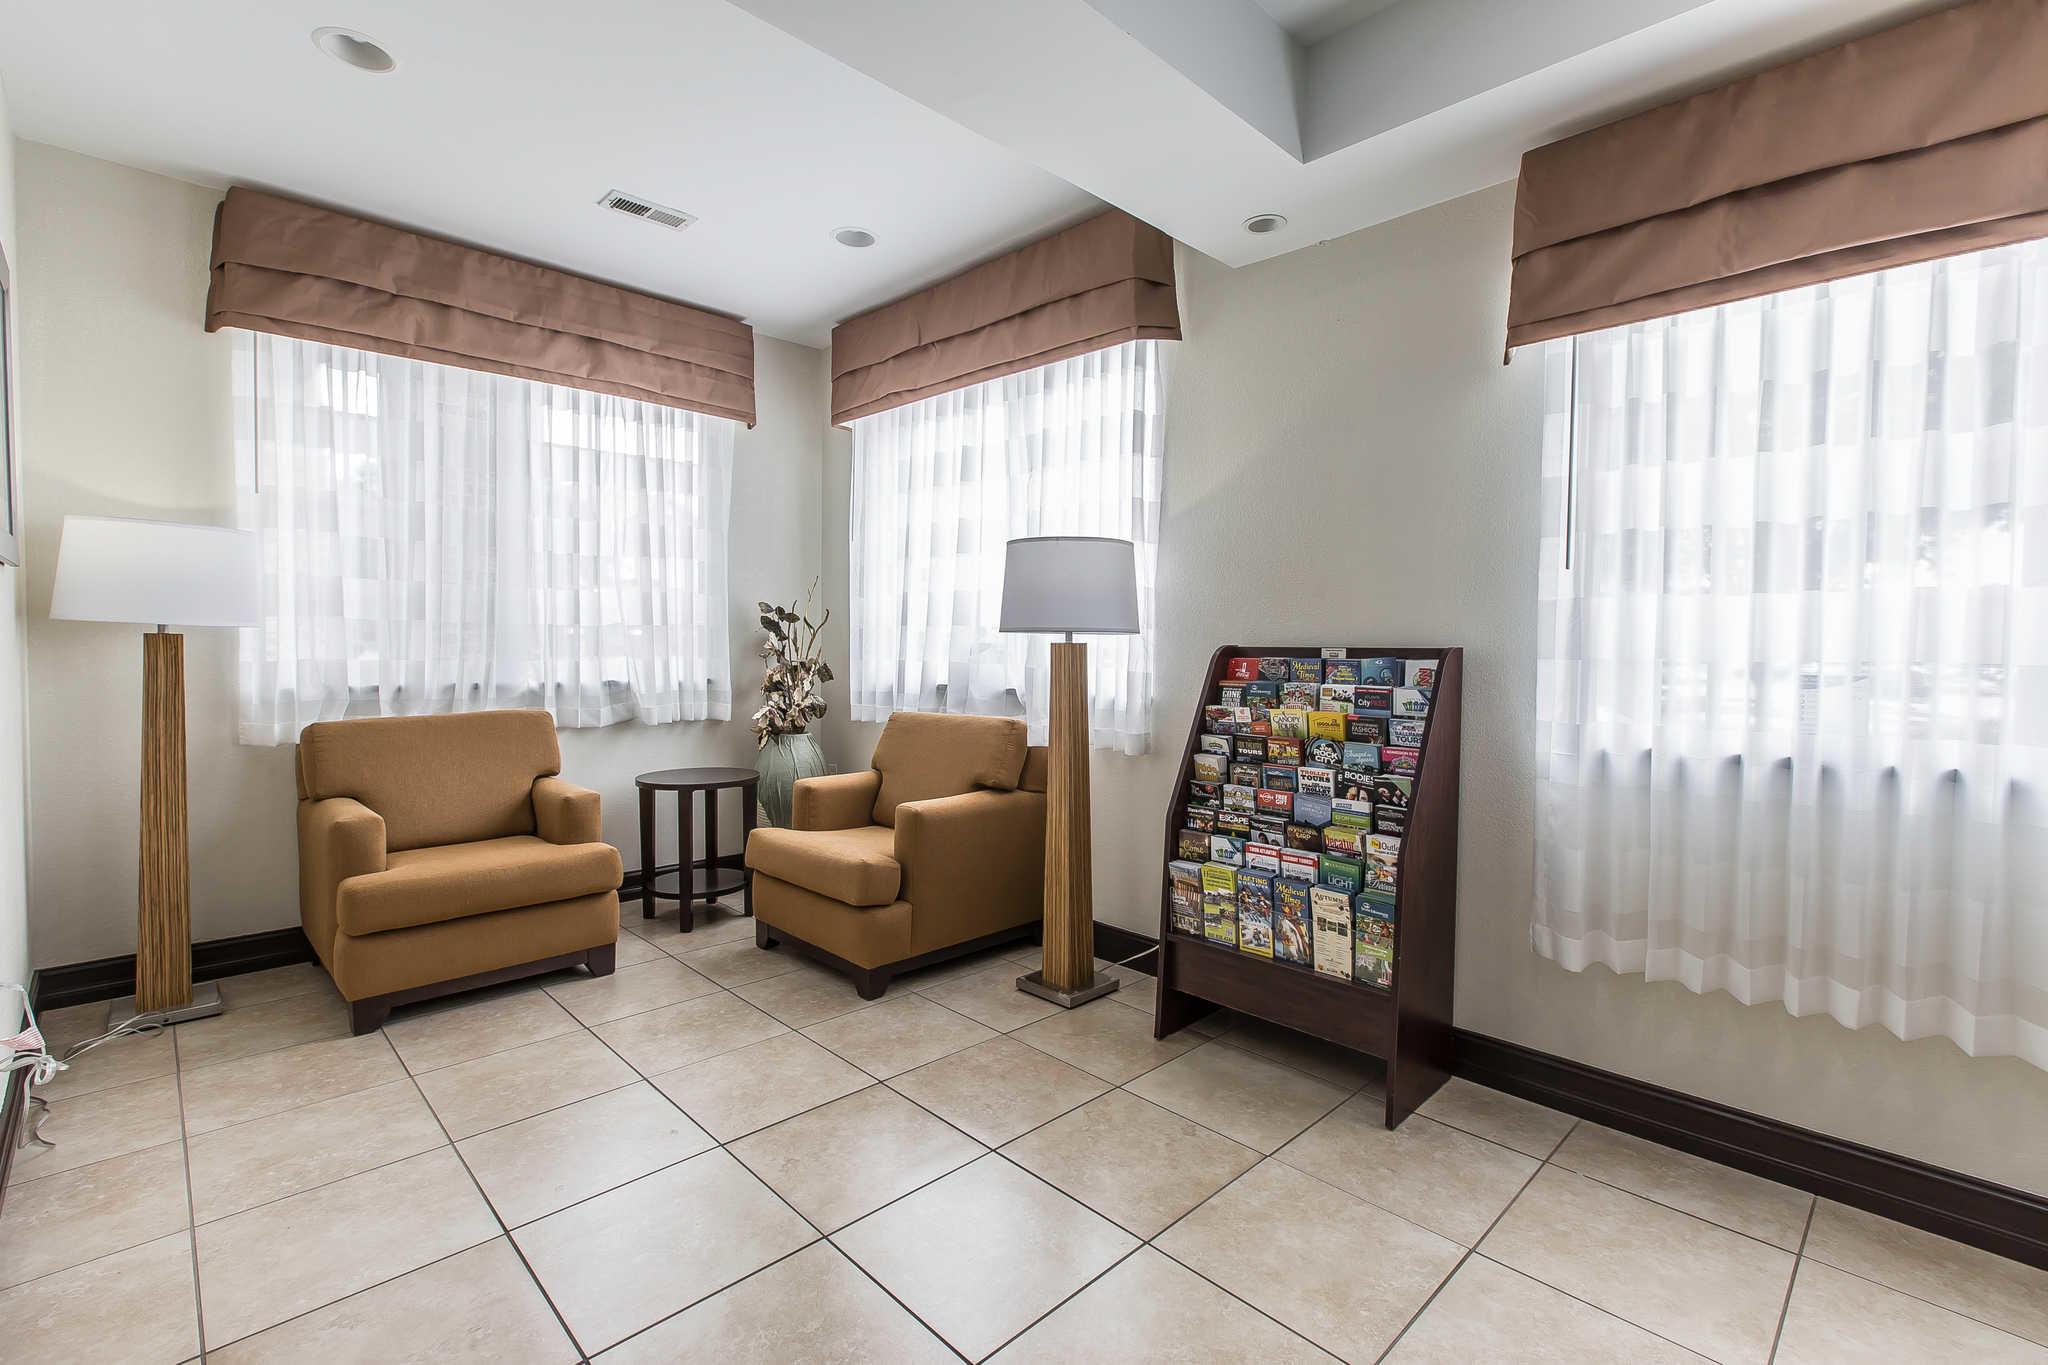 Sleep Inn & Suites At Kennesaw State University image 7